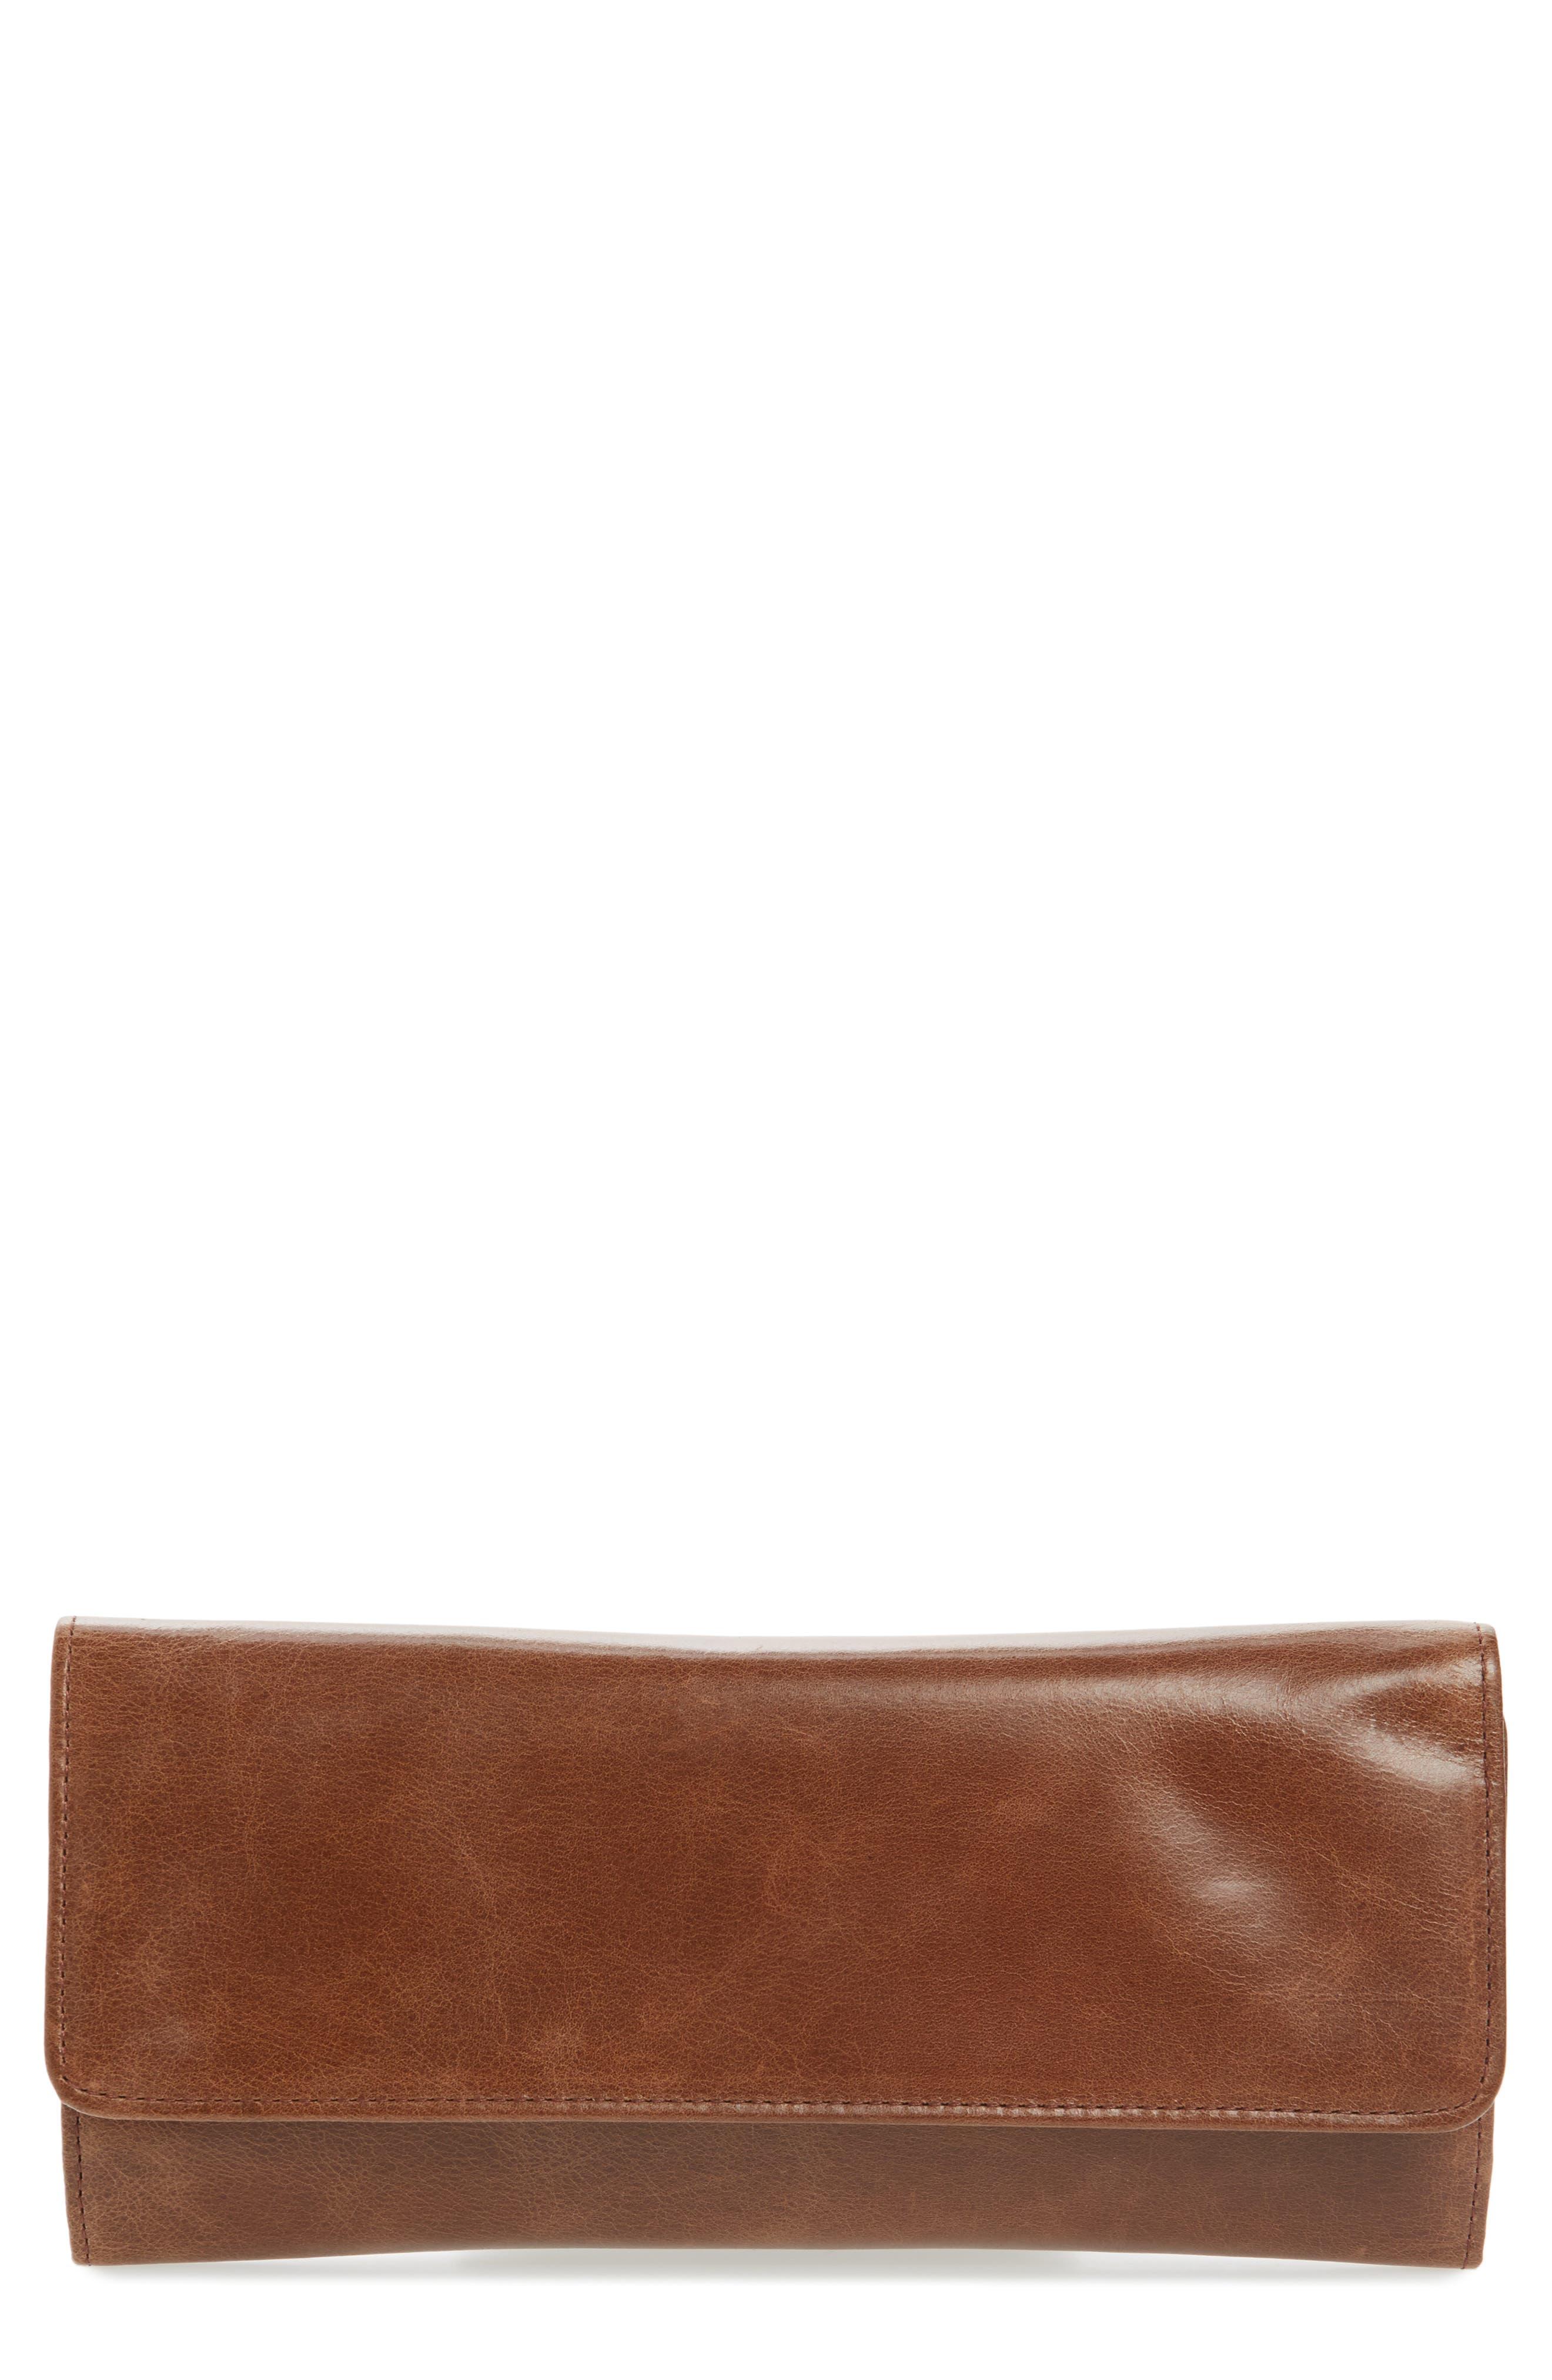 'Sadie' Leather Wallet,                             Main thumbnail 26, color,